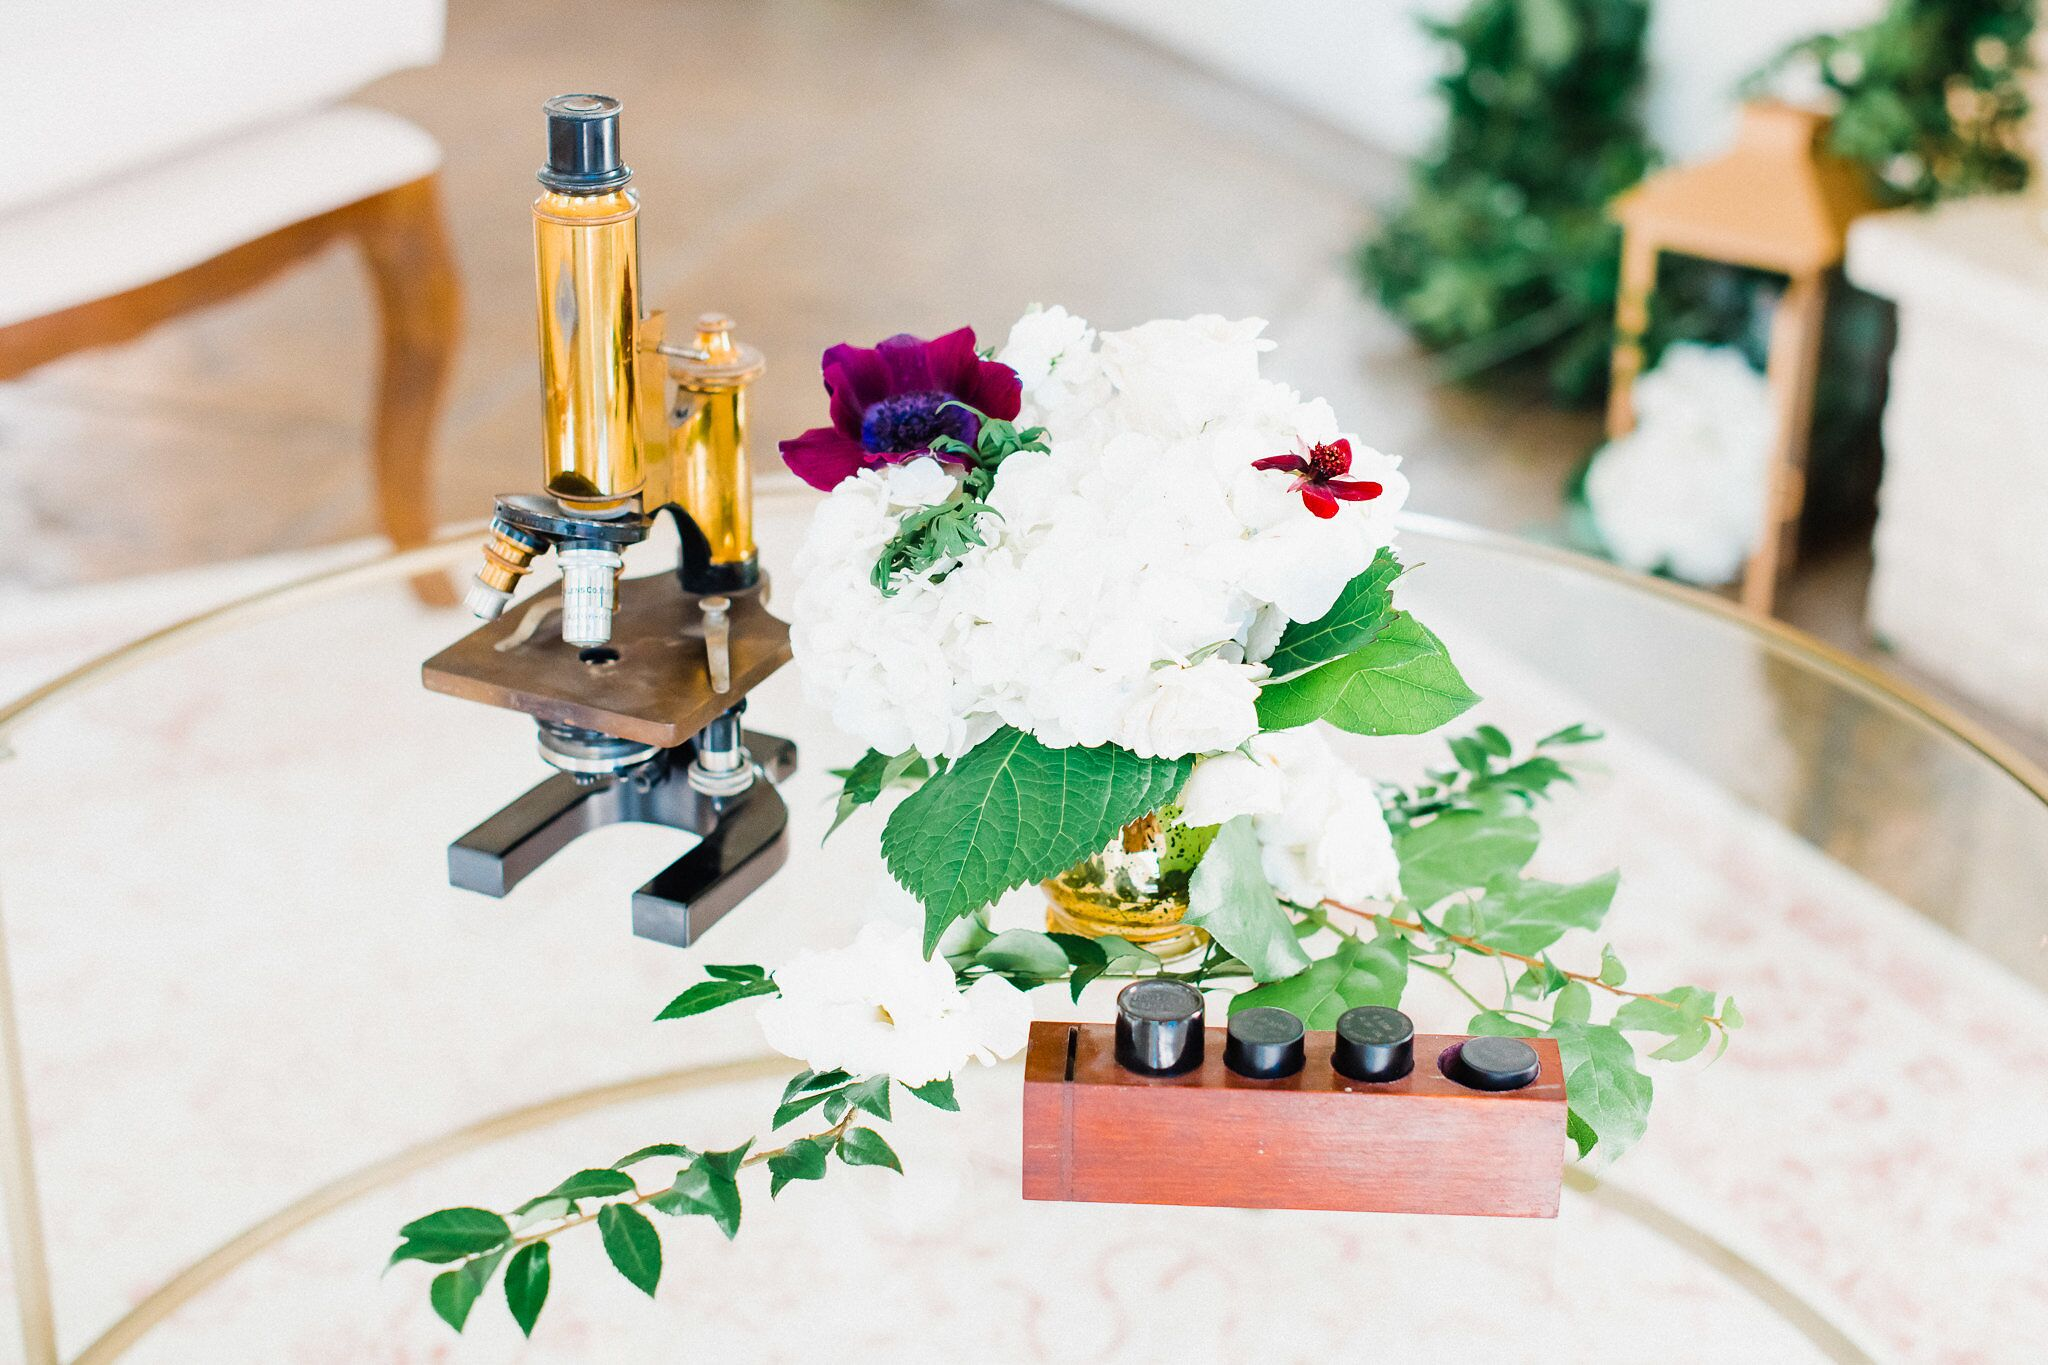 www.santabarbaraweddings.com | Photographer: Grace Kathryn | Venues: Villa & Vine, Santa Barbara Courthouse, Hilton Santa Barbara Resort | Coordination: Burlap & Bordeaux | Vintage Microscope